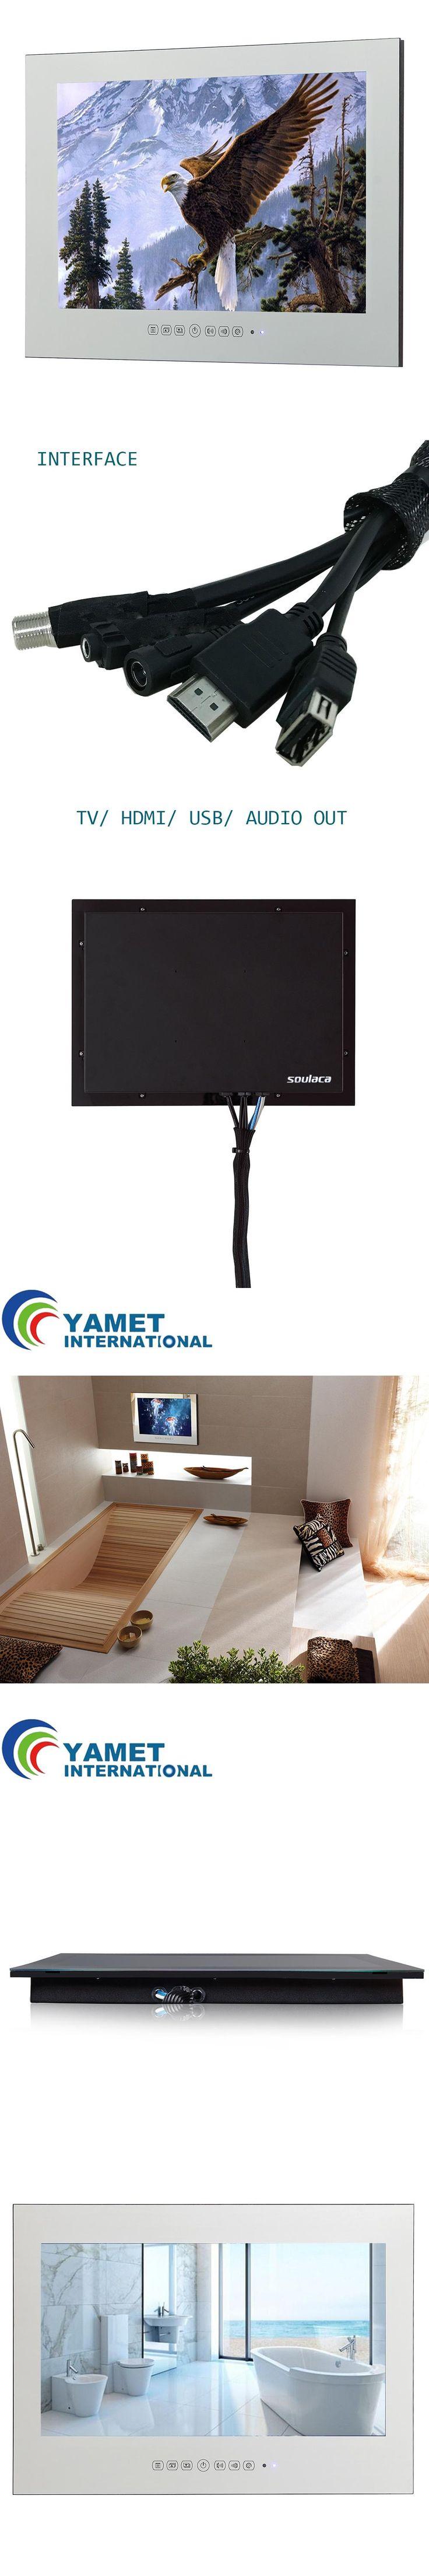 "15.6"" Mirror TV Bathroom Mirror TV Waterproof LED TV with DVB-T FreeView ATSC HDMI USB"